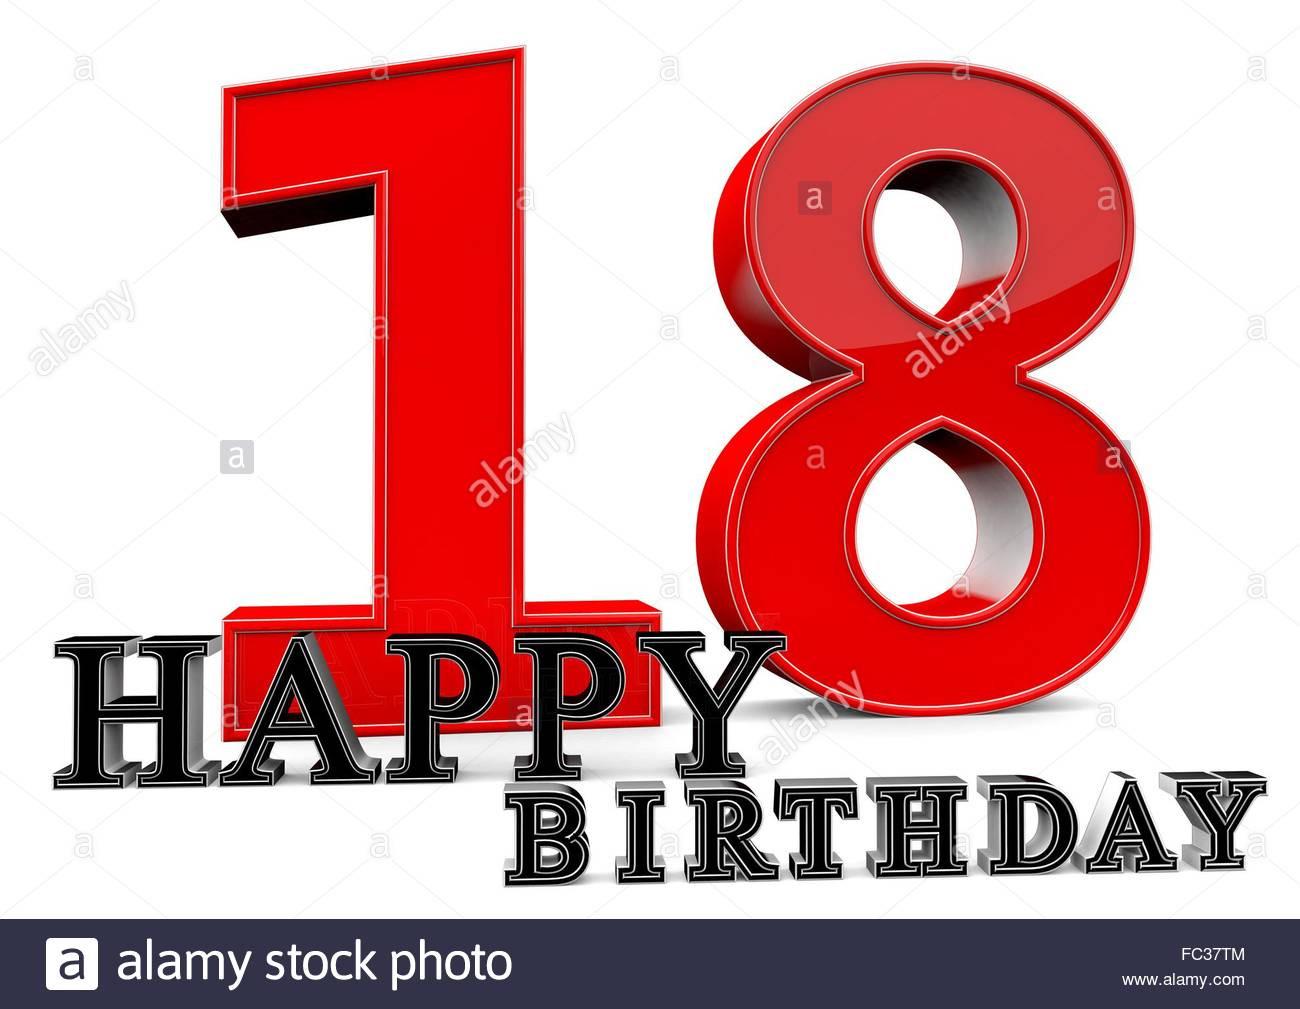 Geburtstagsideen Zum 18  Happy Birthday zum 18 Geburtstag Stock